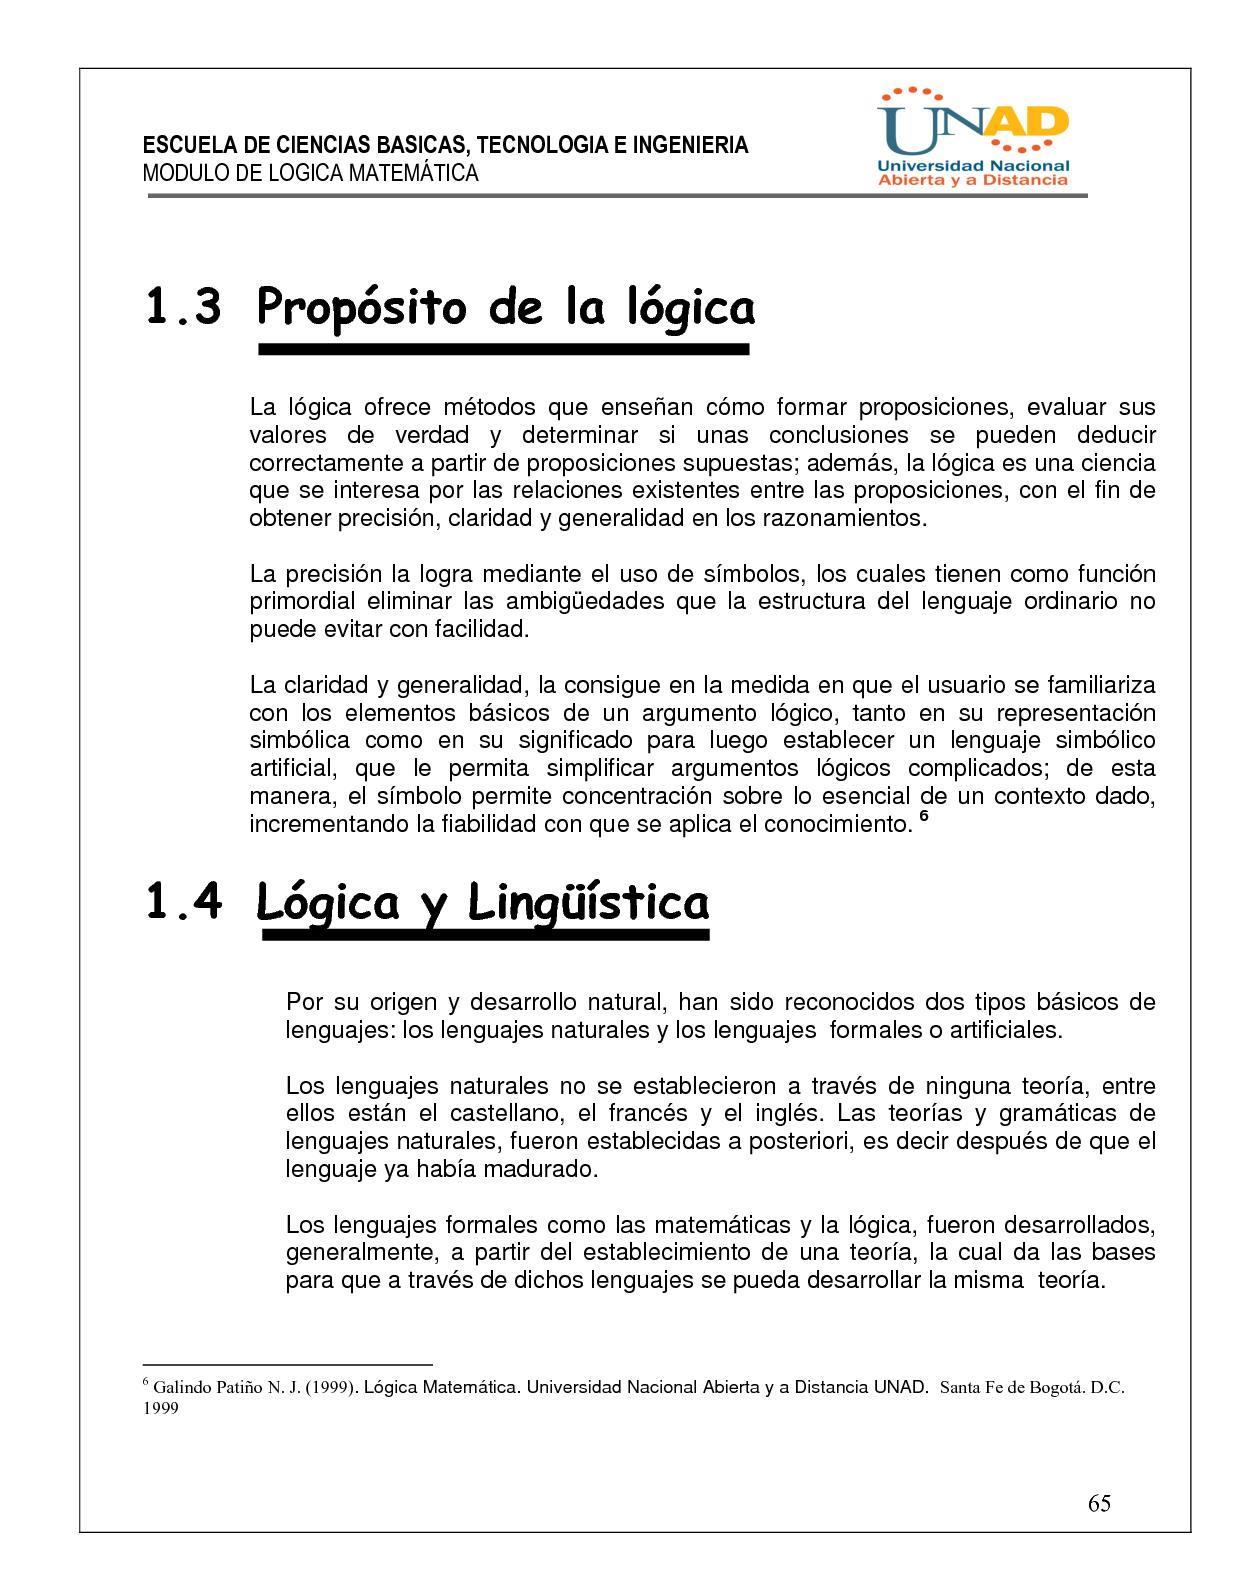 Modulo De Logica Matematica 90004 2012 Calameo Downloader